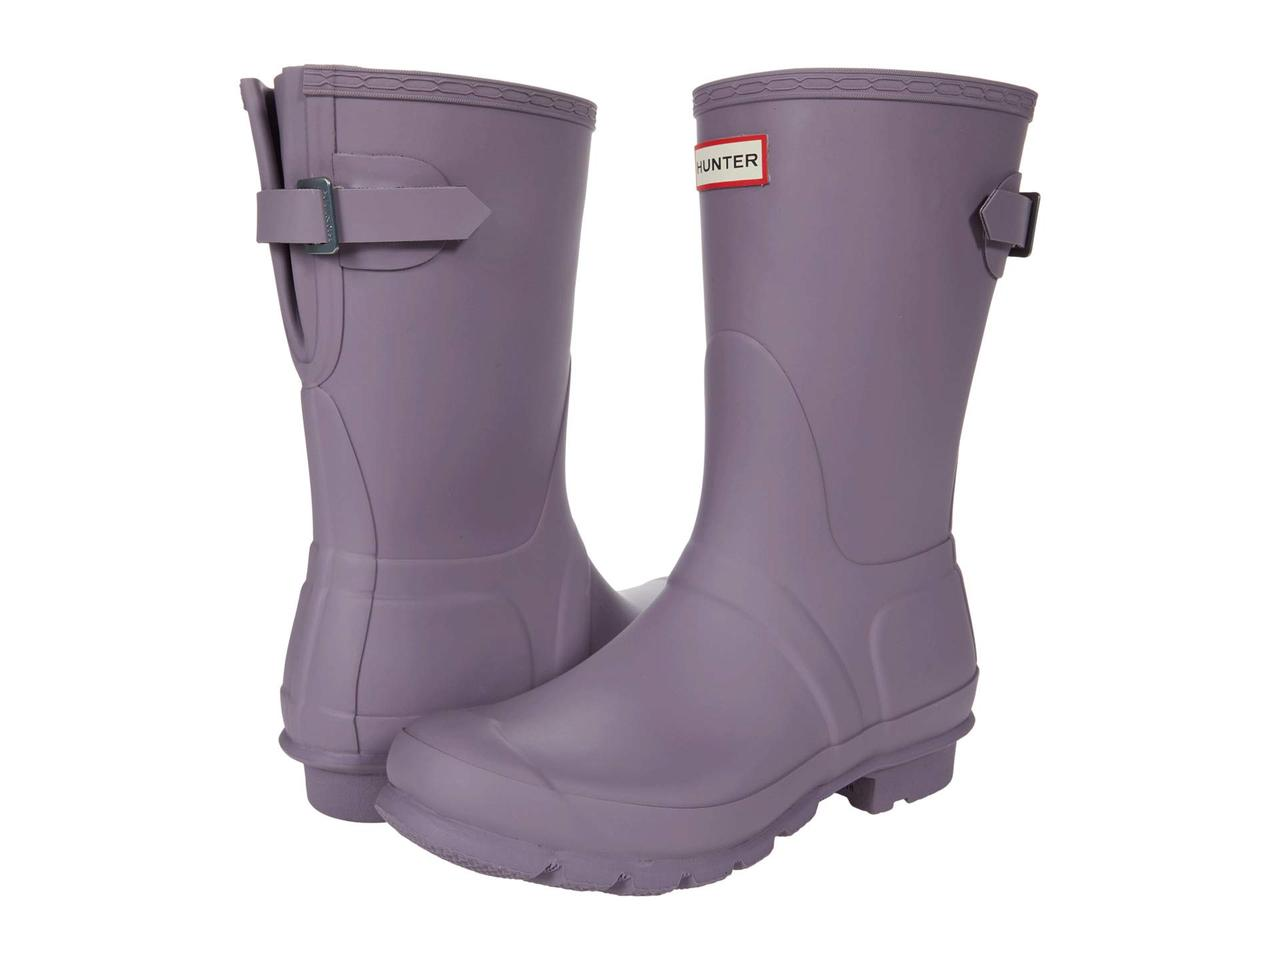 Ботинки/Сапоги (Оригинал) Hunter Original Short Back Adjustable Rain Boots Purple Top